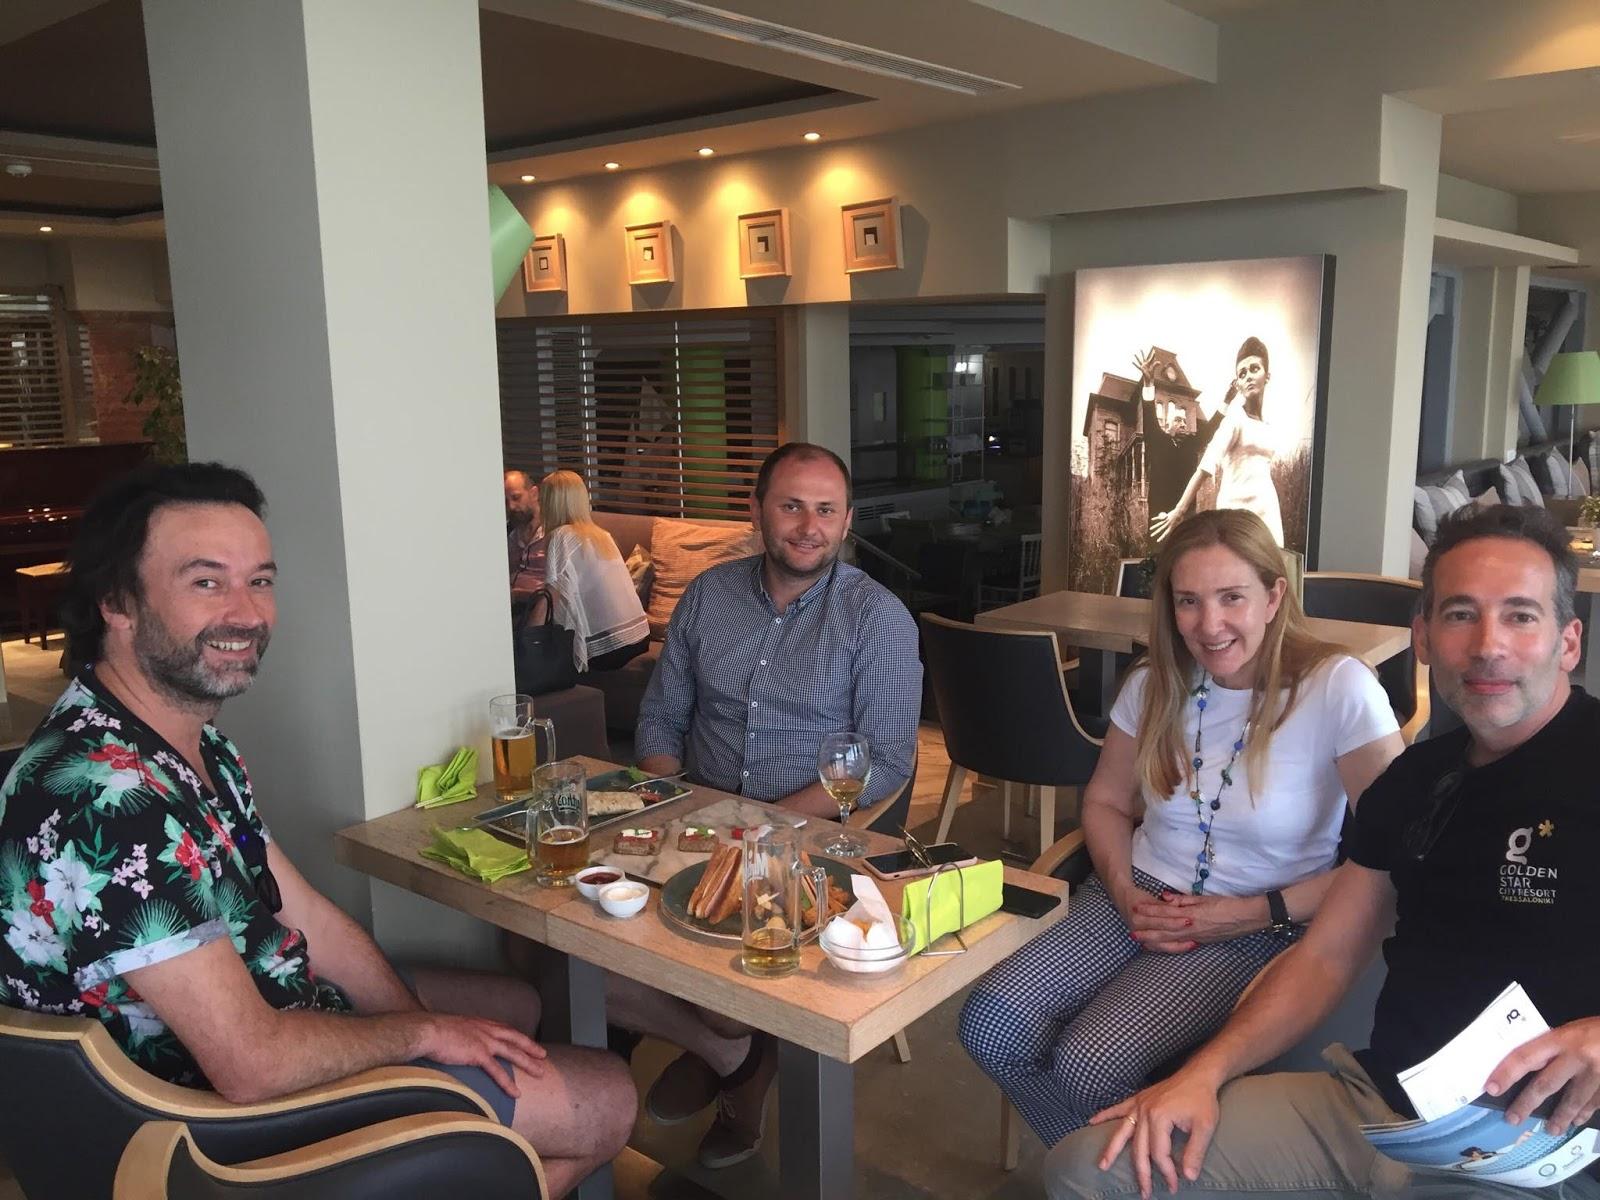 Fam trip για πολωνούς tour operators στη Θεσσαλονίκη των γεύσεων και της UNESCO